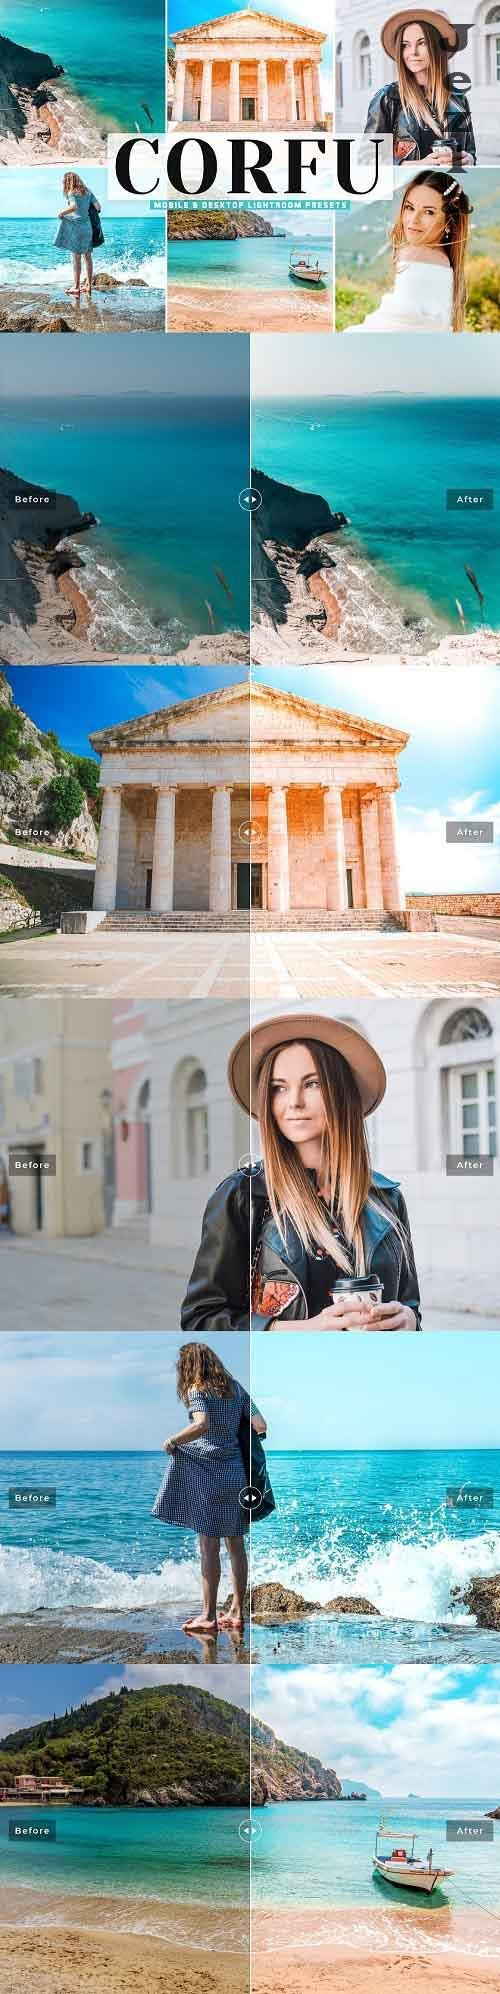 Corfu Pro Lightroom Presets - 5772671 - Mobile & Desktop